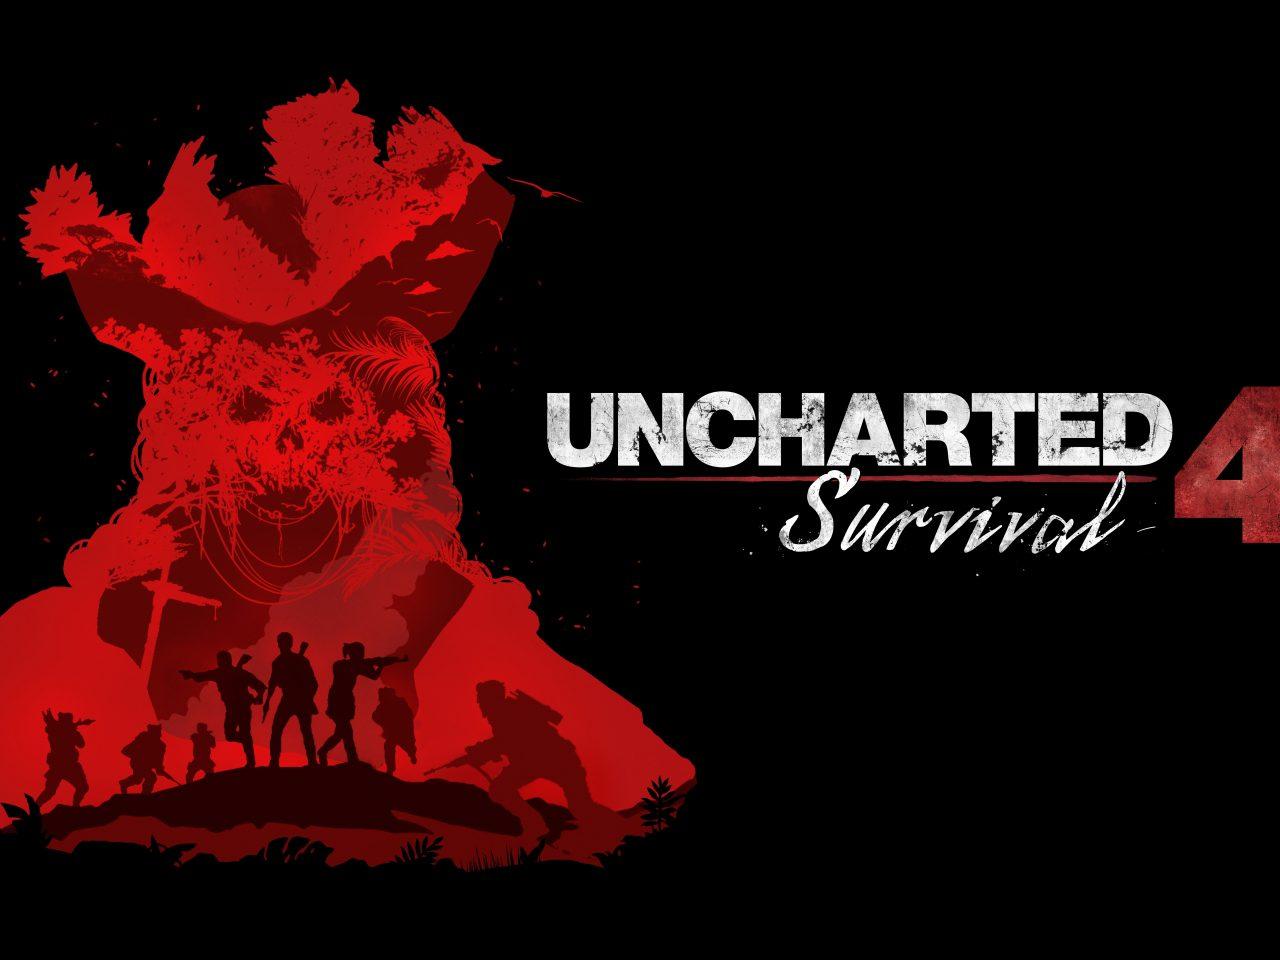 Anushka Hd Wallpaper Photos Uncharted 4 Survival 4k 8k Wallpaper Hd Wallpaper Background